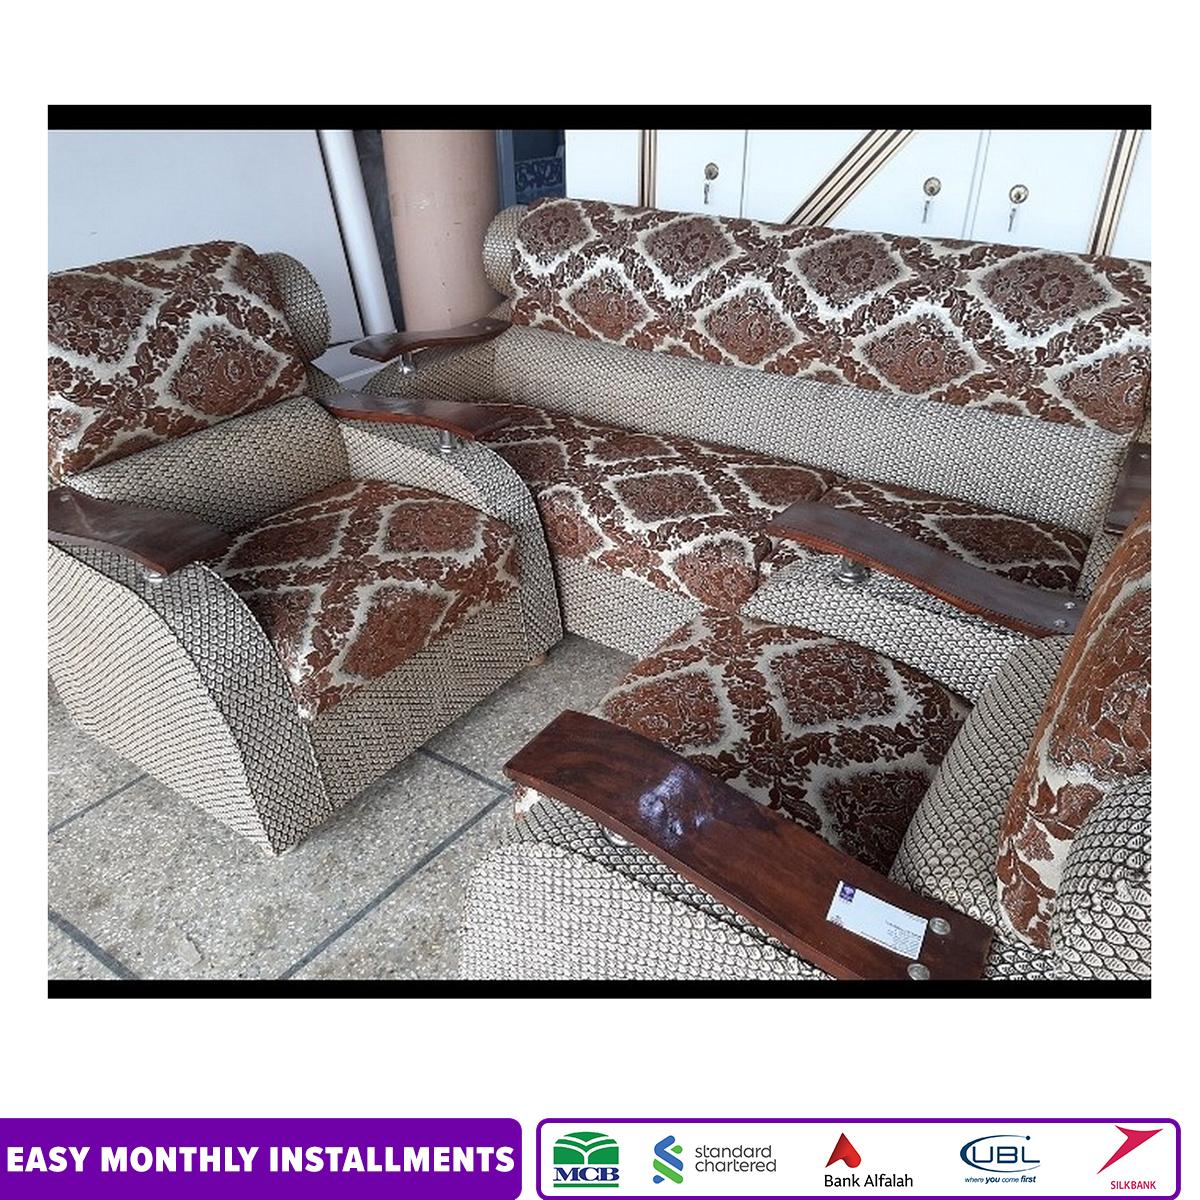 Luxury Elegant Sofa Set - Printed J-Card Fabric Seats - Curved Wooden Arm Rests | 5 Seated Sofa Set |